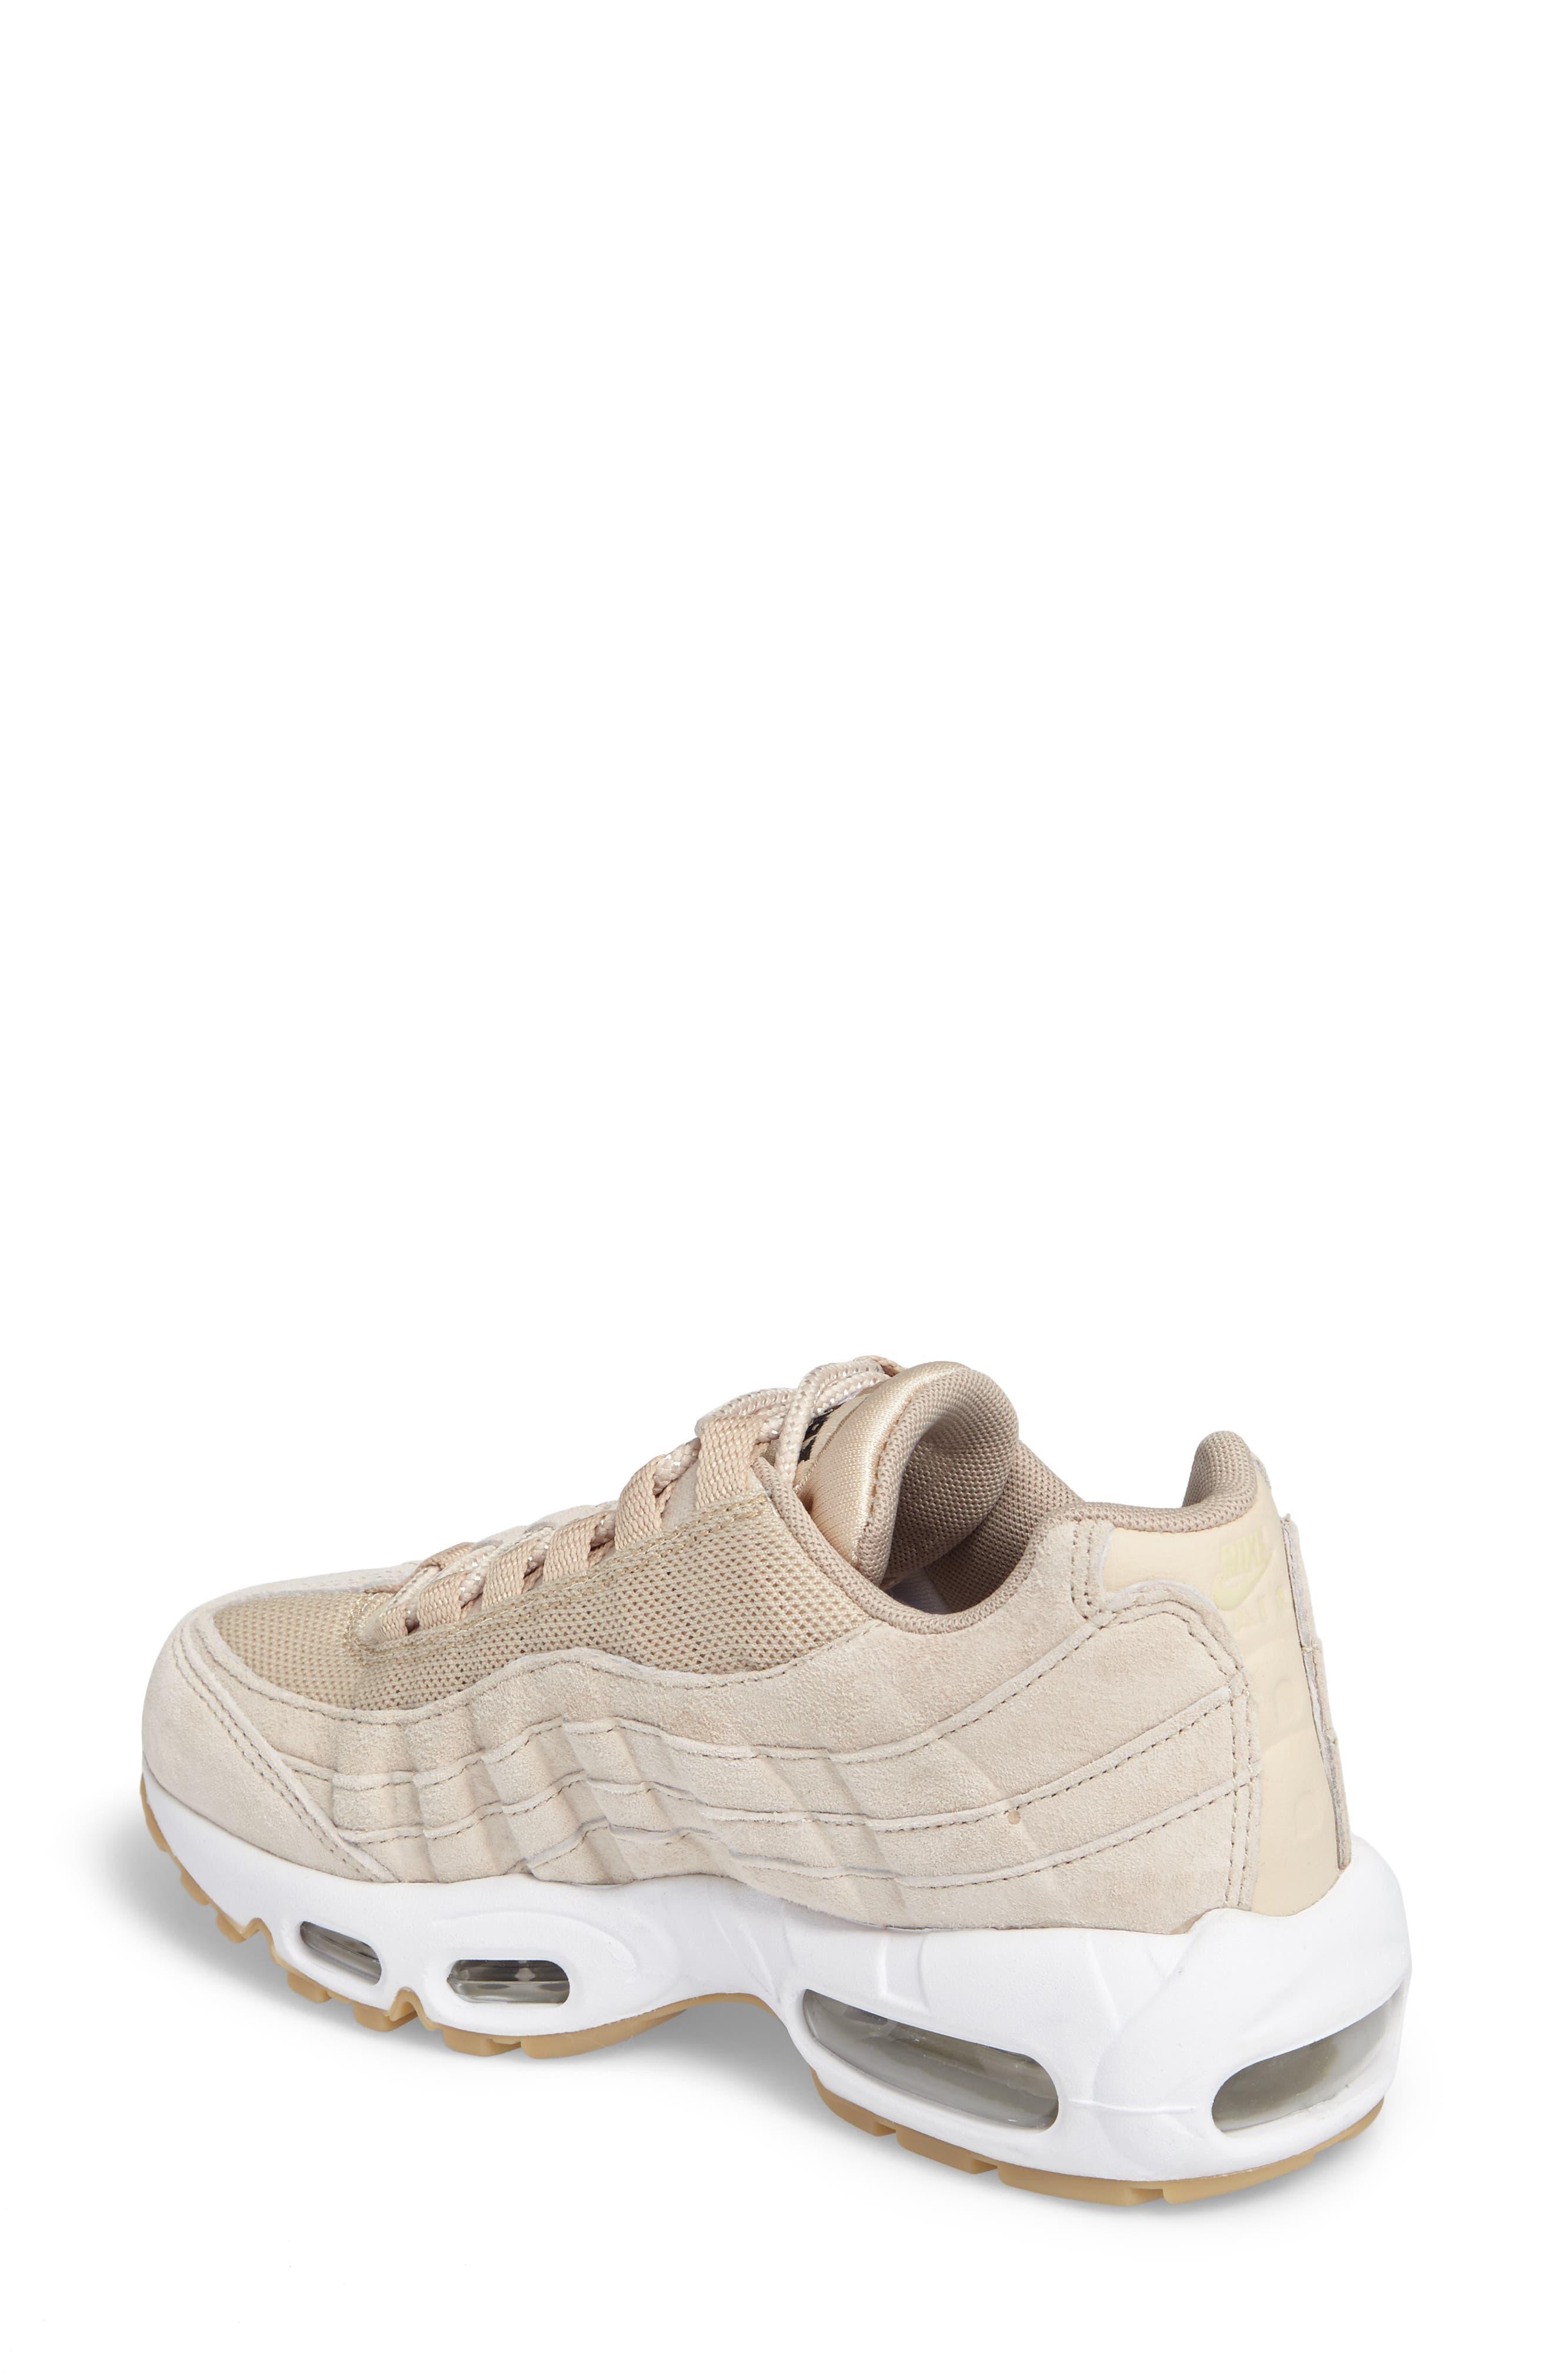 Air Max 95 SD Sneaker,                             Alternate thumbnail 2, color,                             Oatmeal/ White